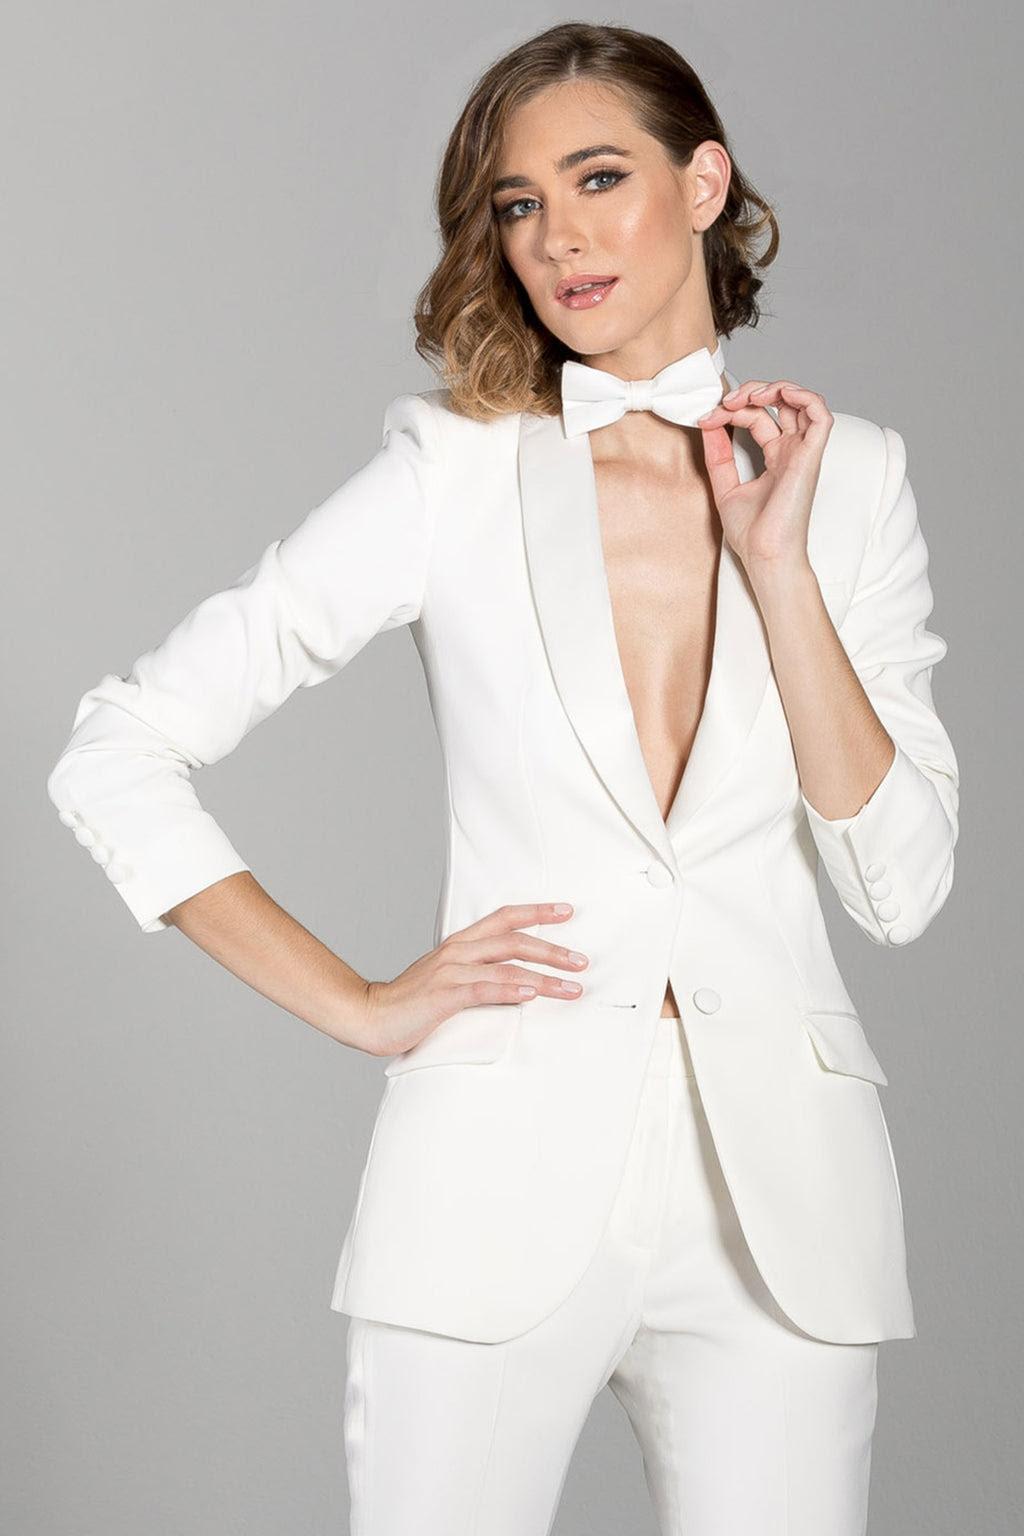 d9daf793e36 Long White Shawl Women s Tux Jacket Little Black Tux